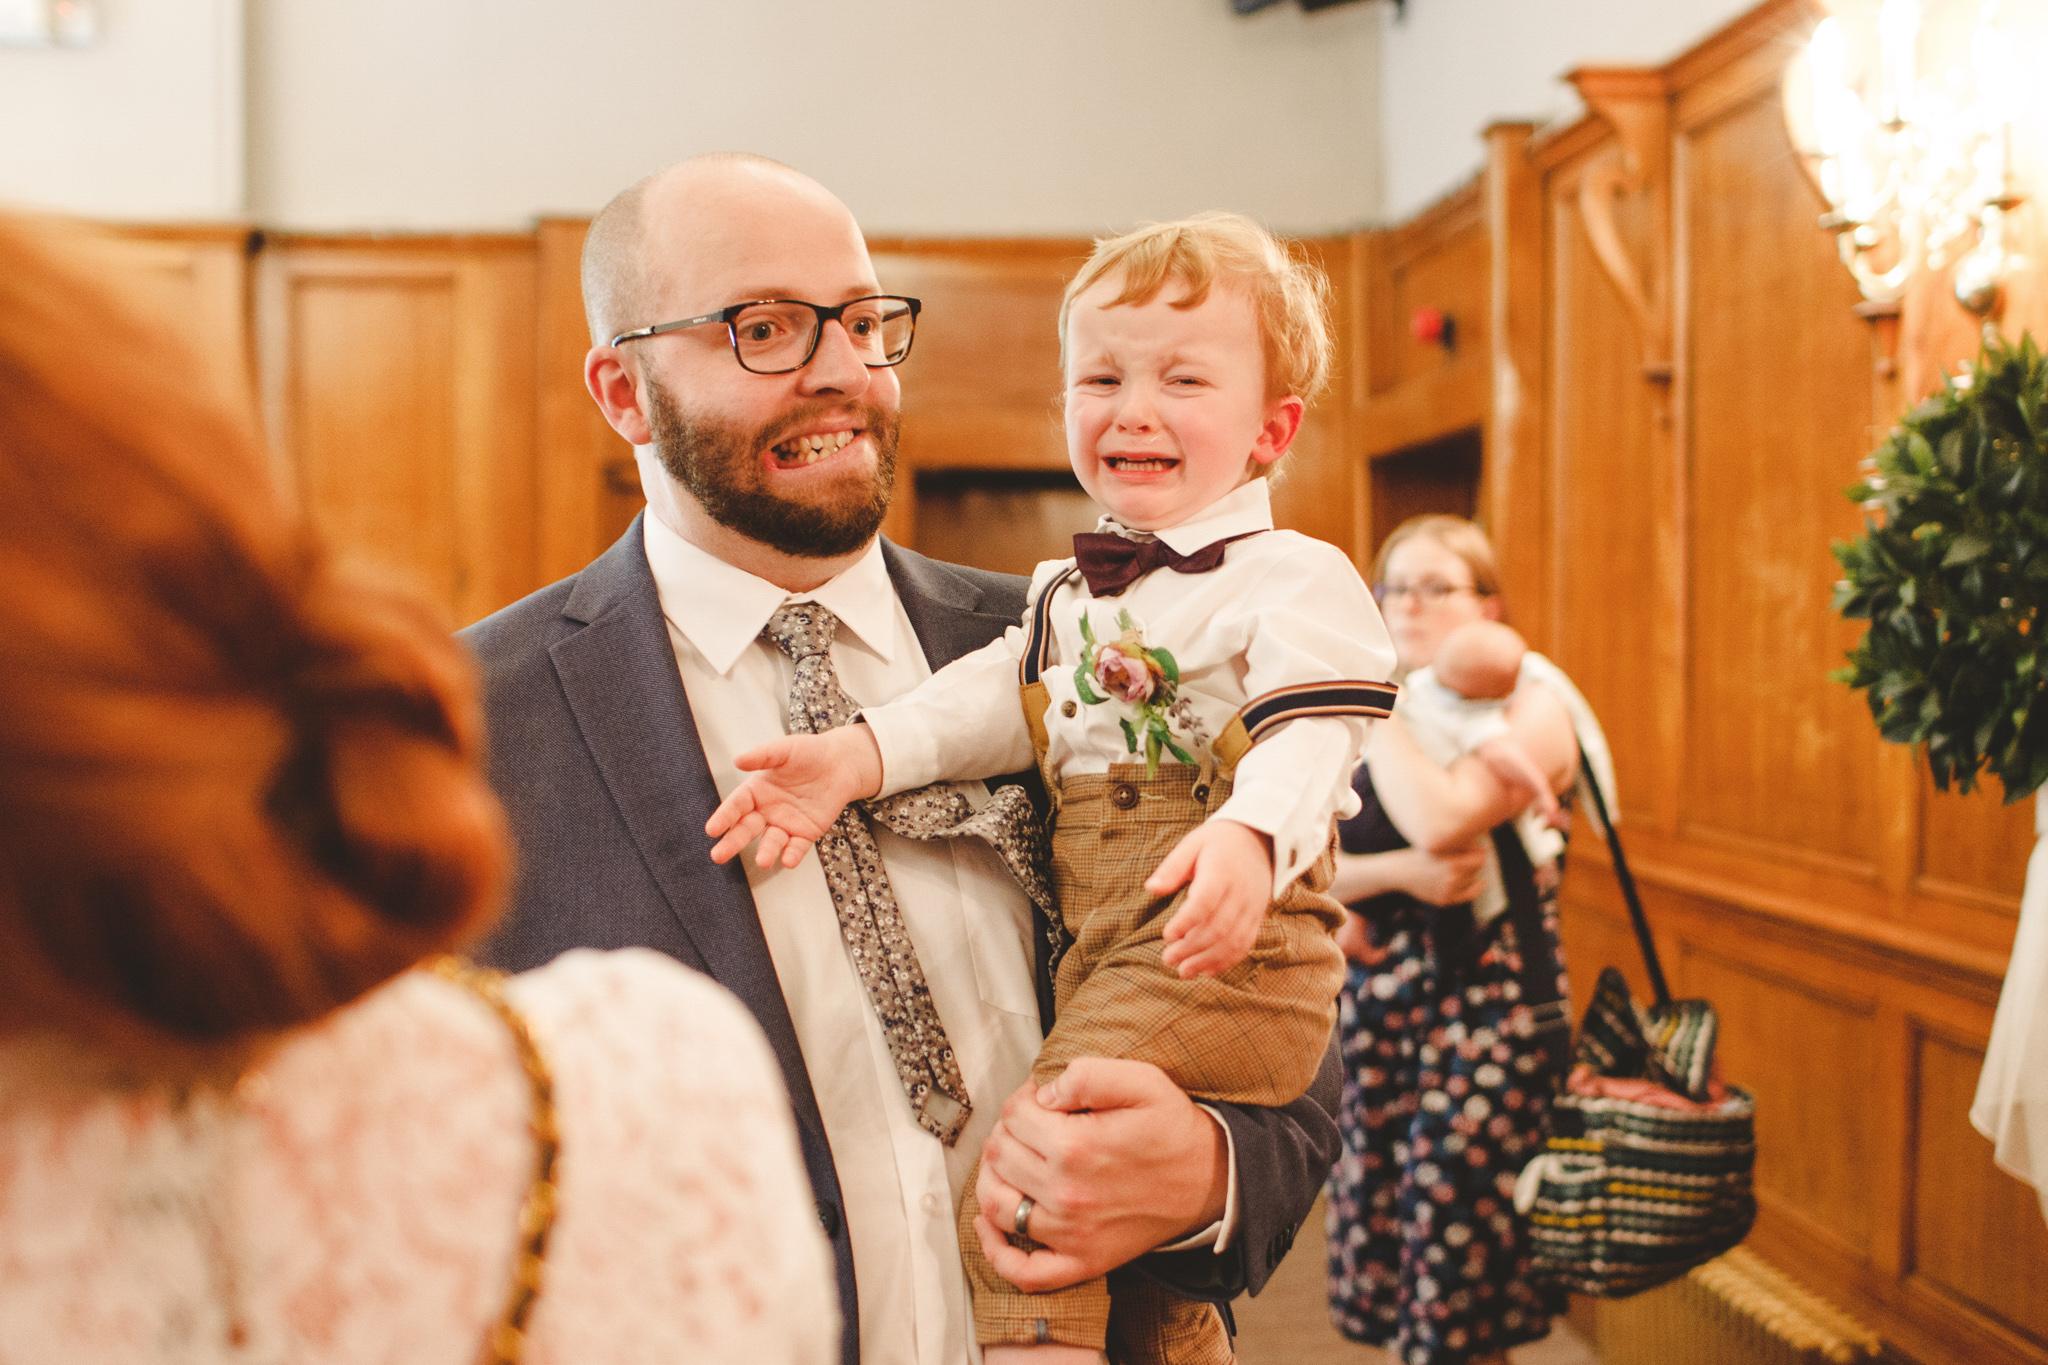 derbyshire-wedding-photographer-videographer-camera-hannah-32.jpg